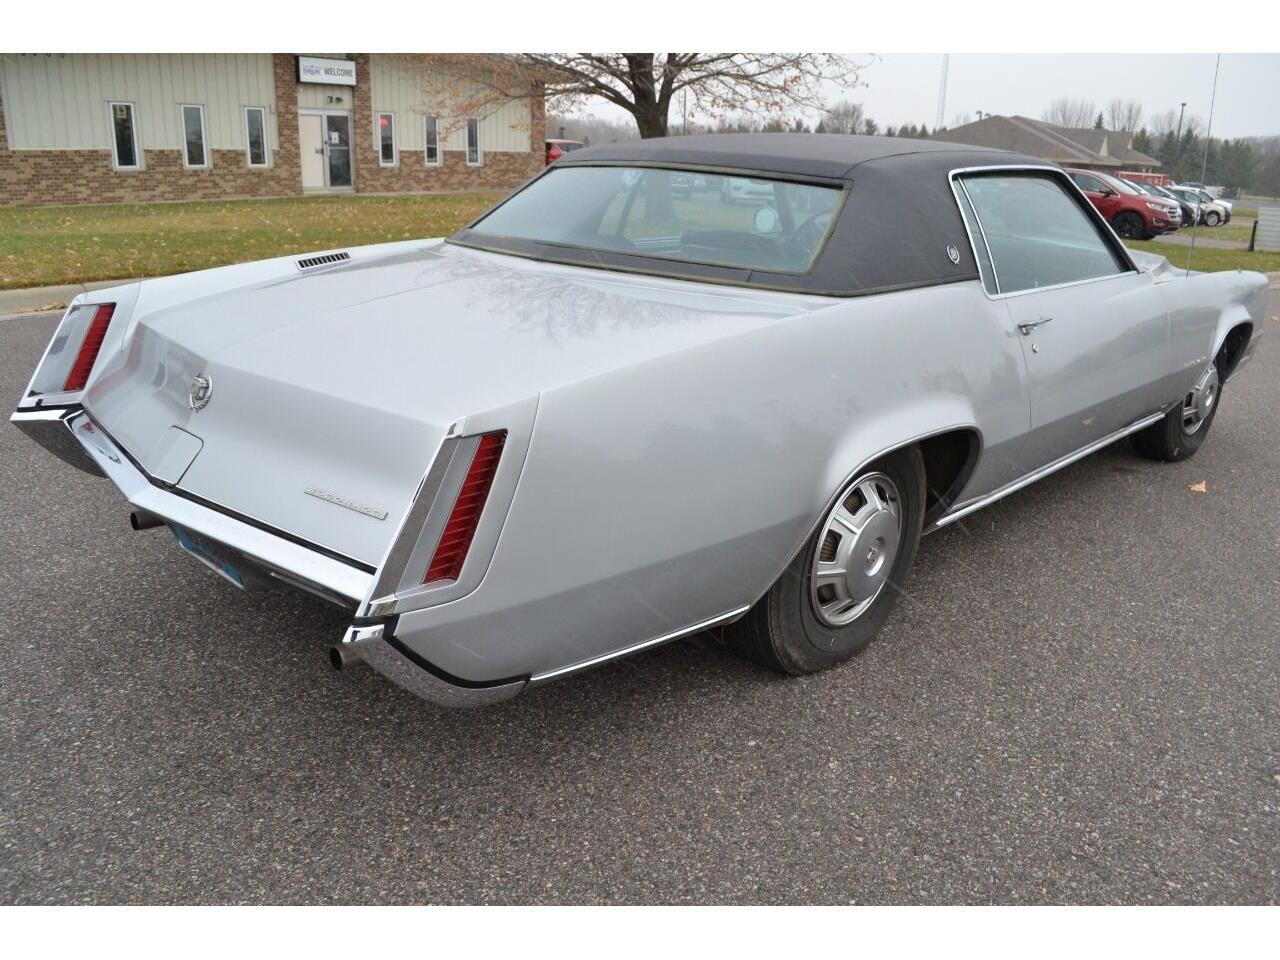 1967 Cadillac Eldorado (CC-1421406) for sale in Ramsey, Minnesota